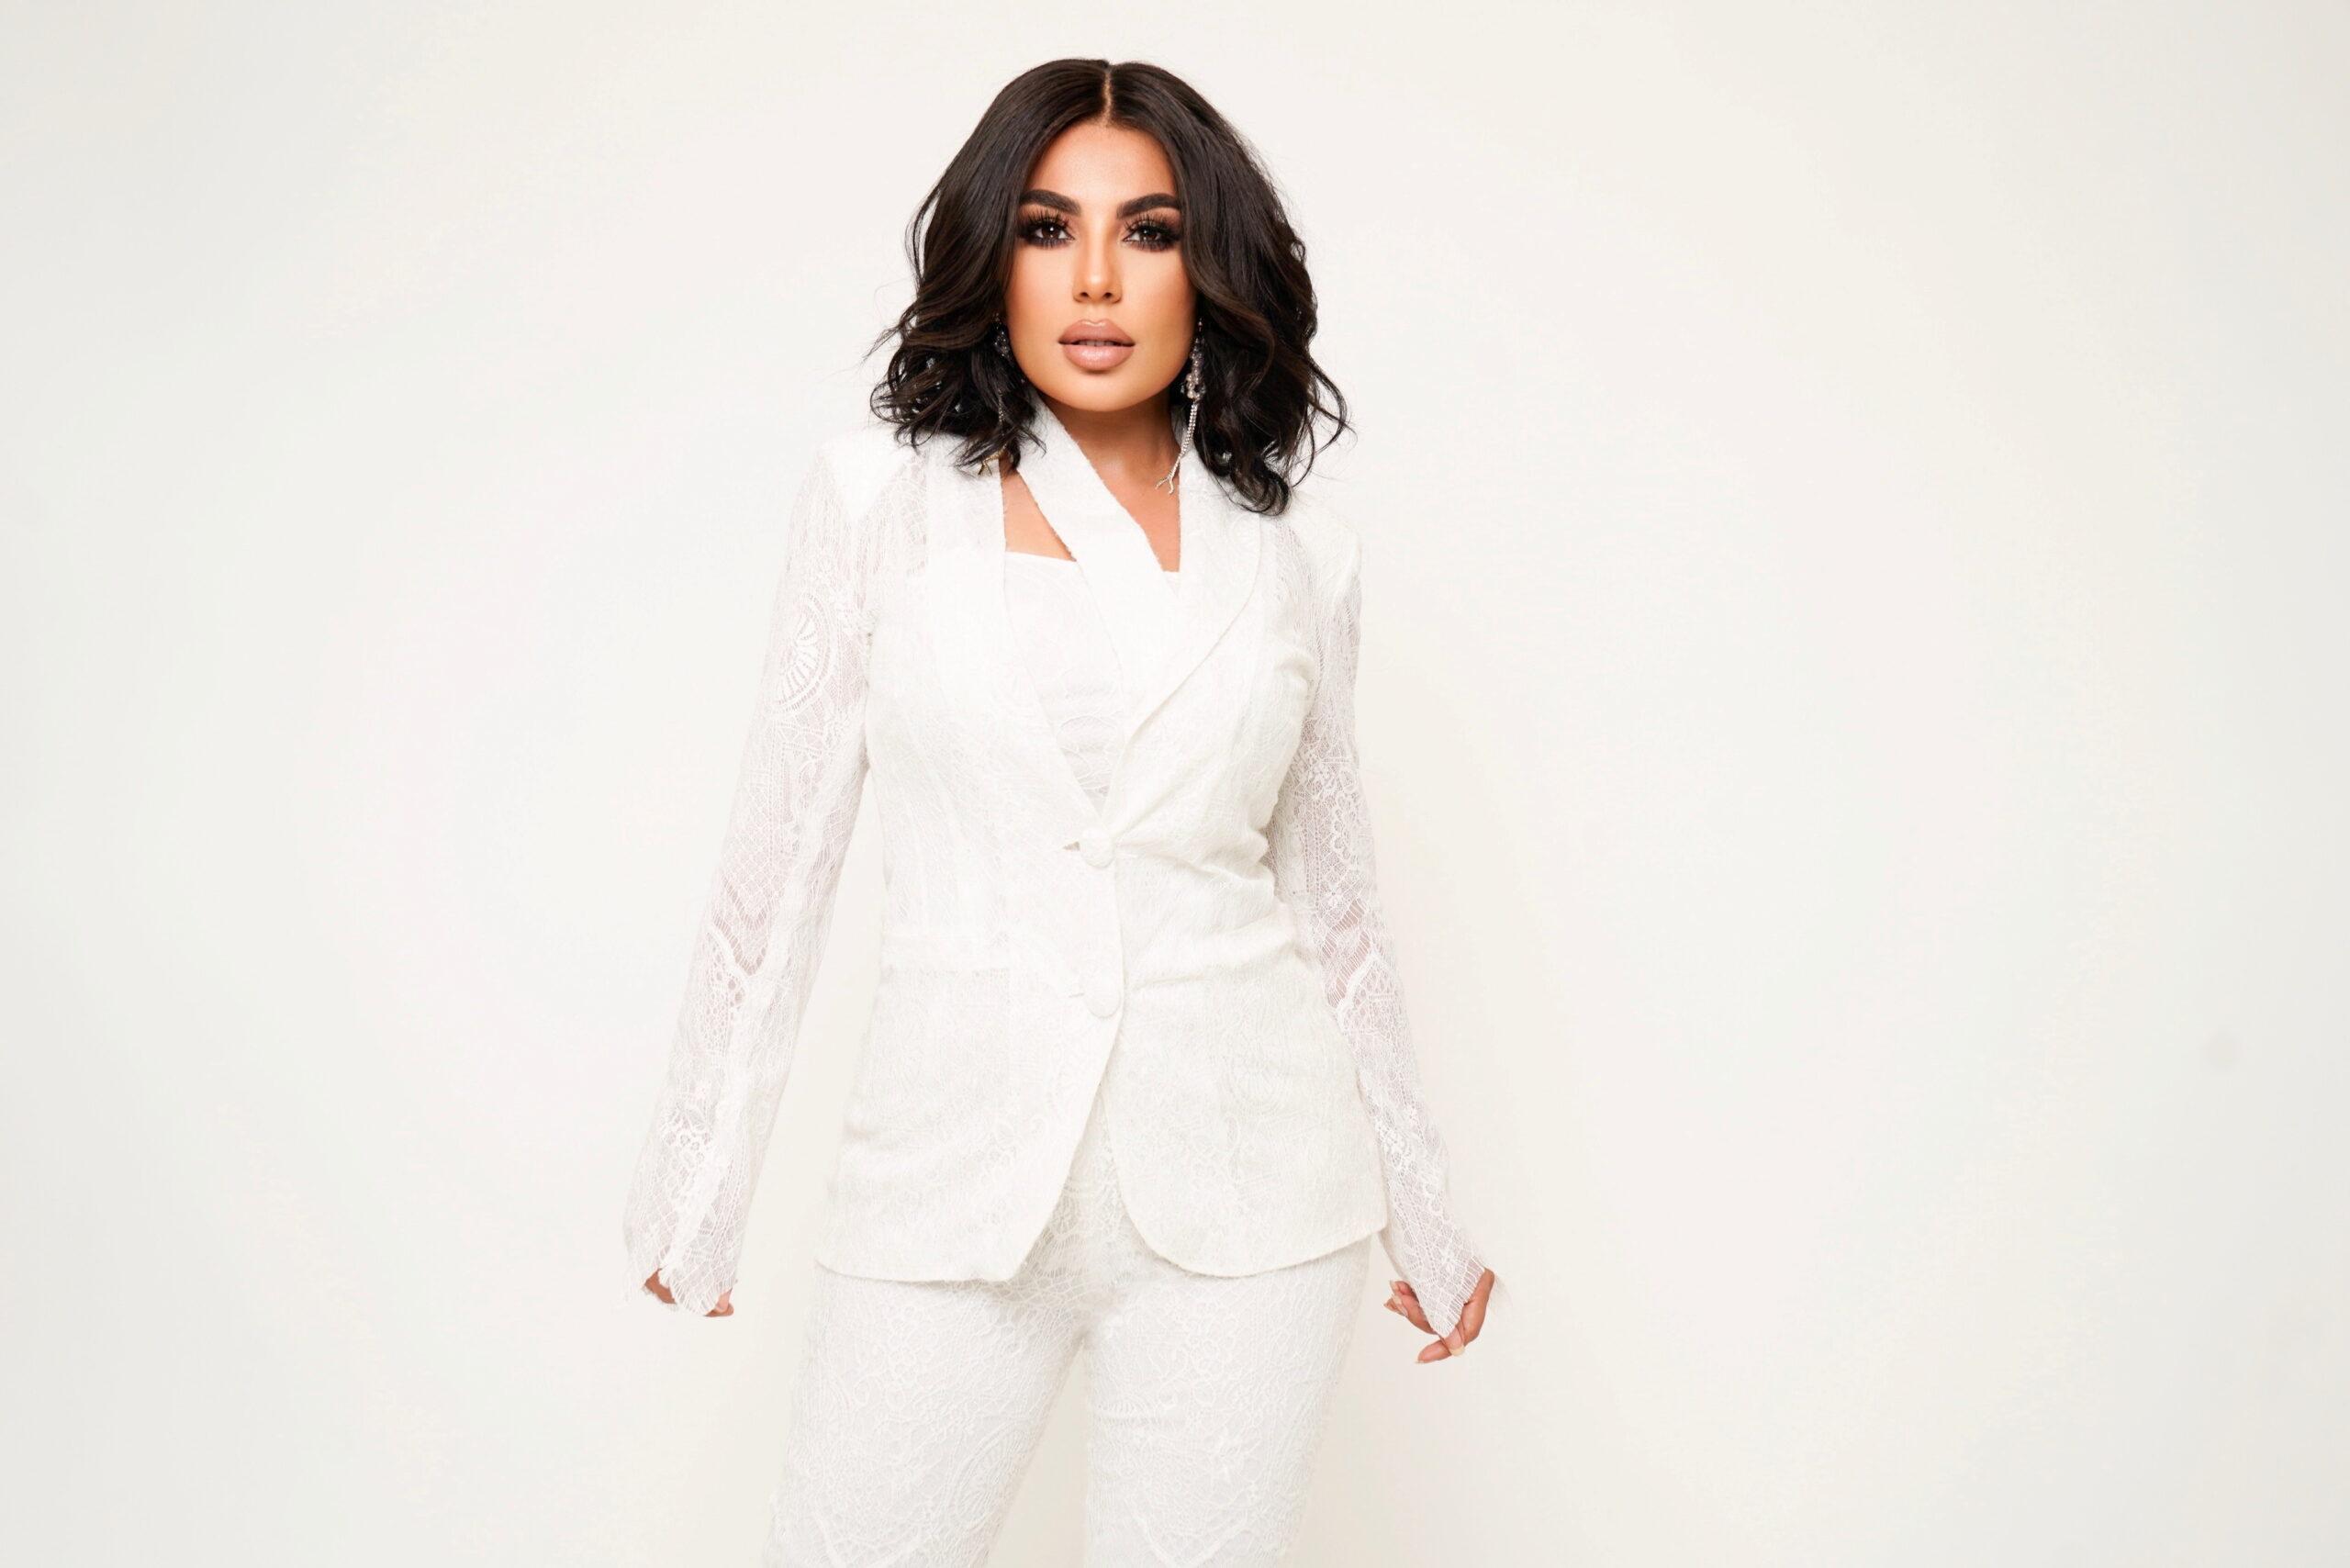 Aryana Sayeed-Tραγουδίστρια & pop star